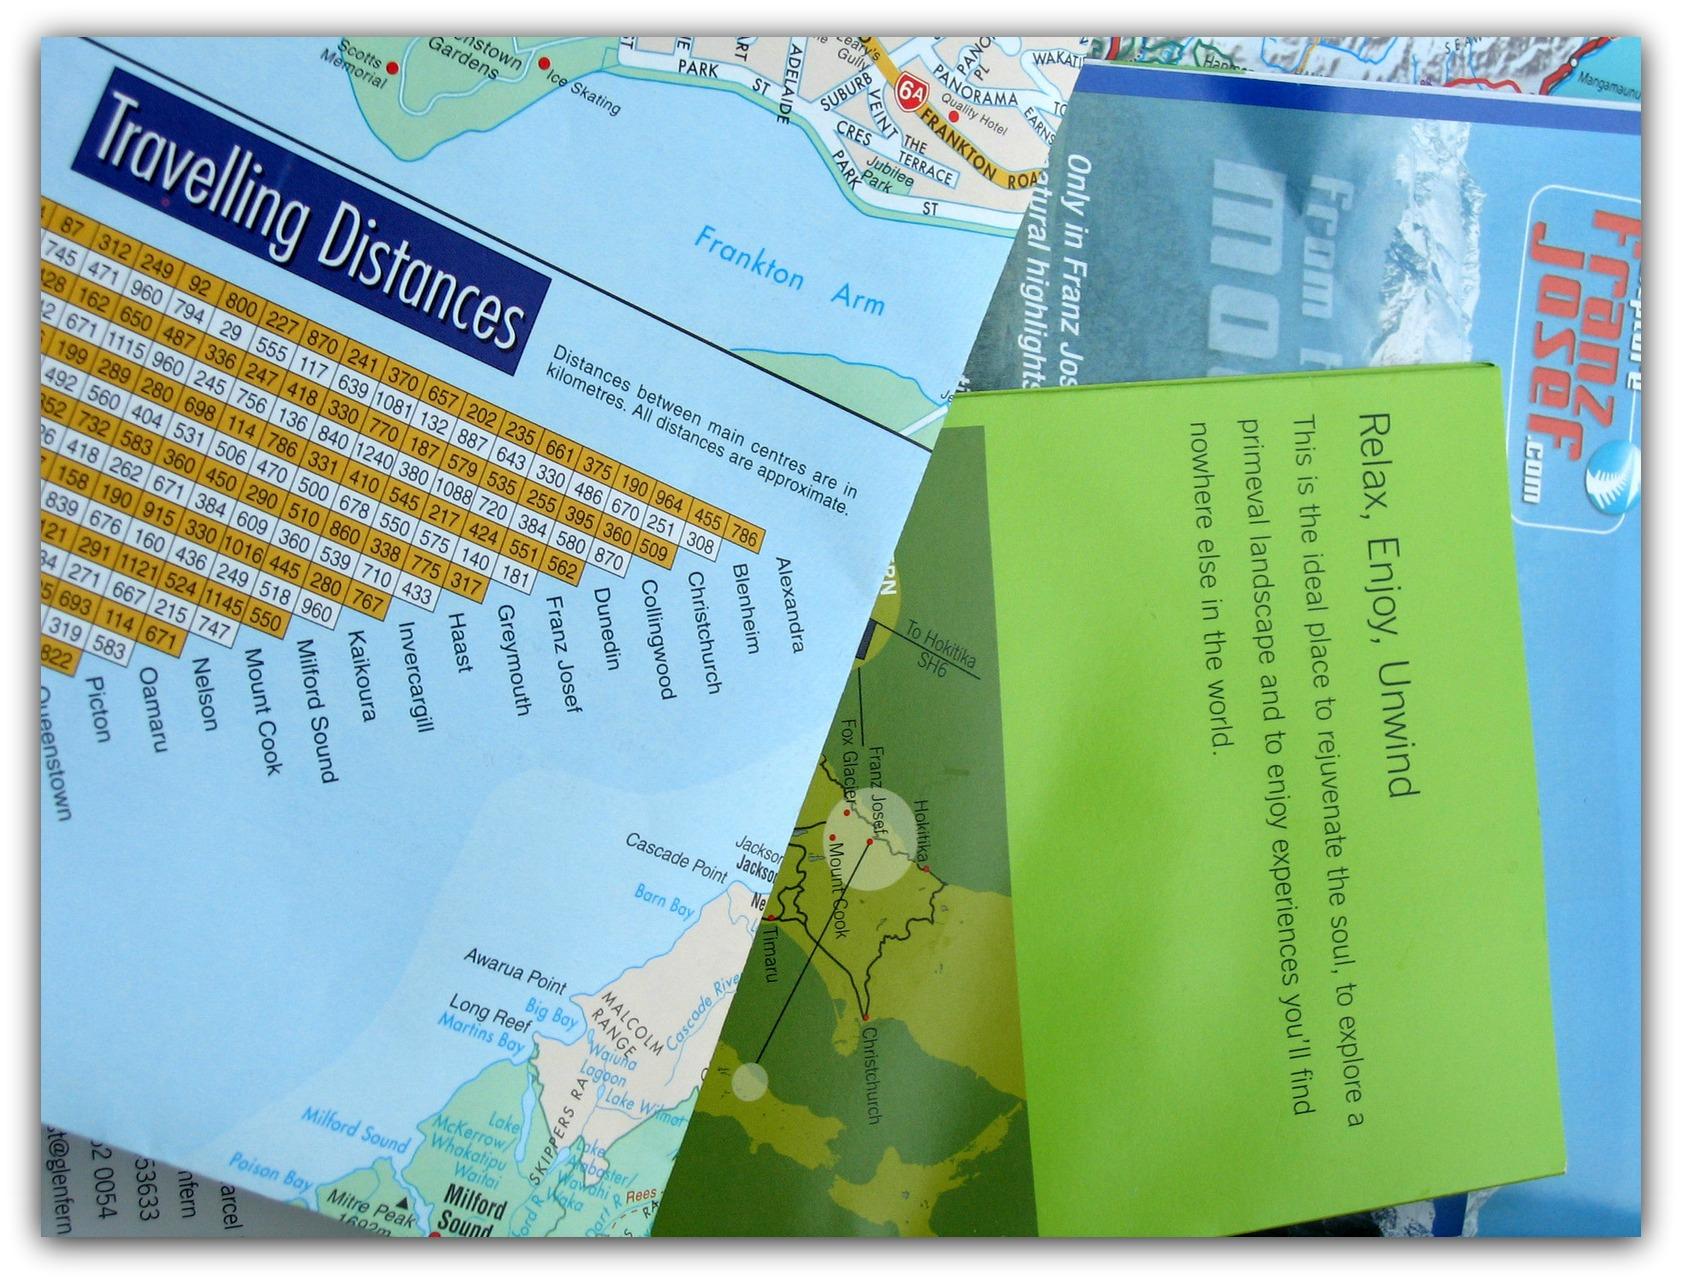 vacation-planning-1524450-1600x1200